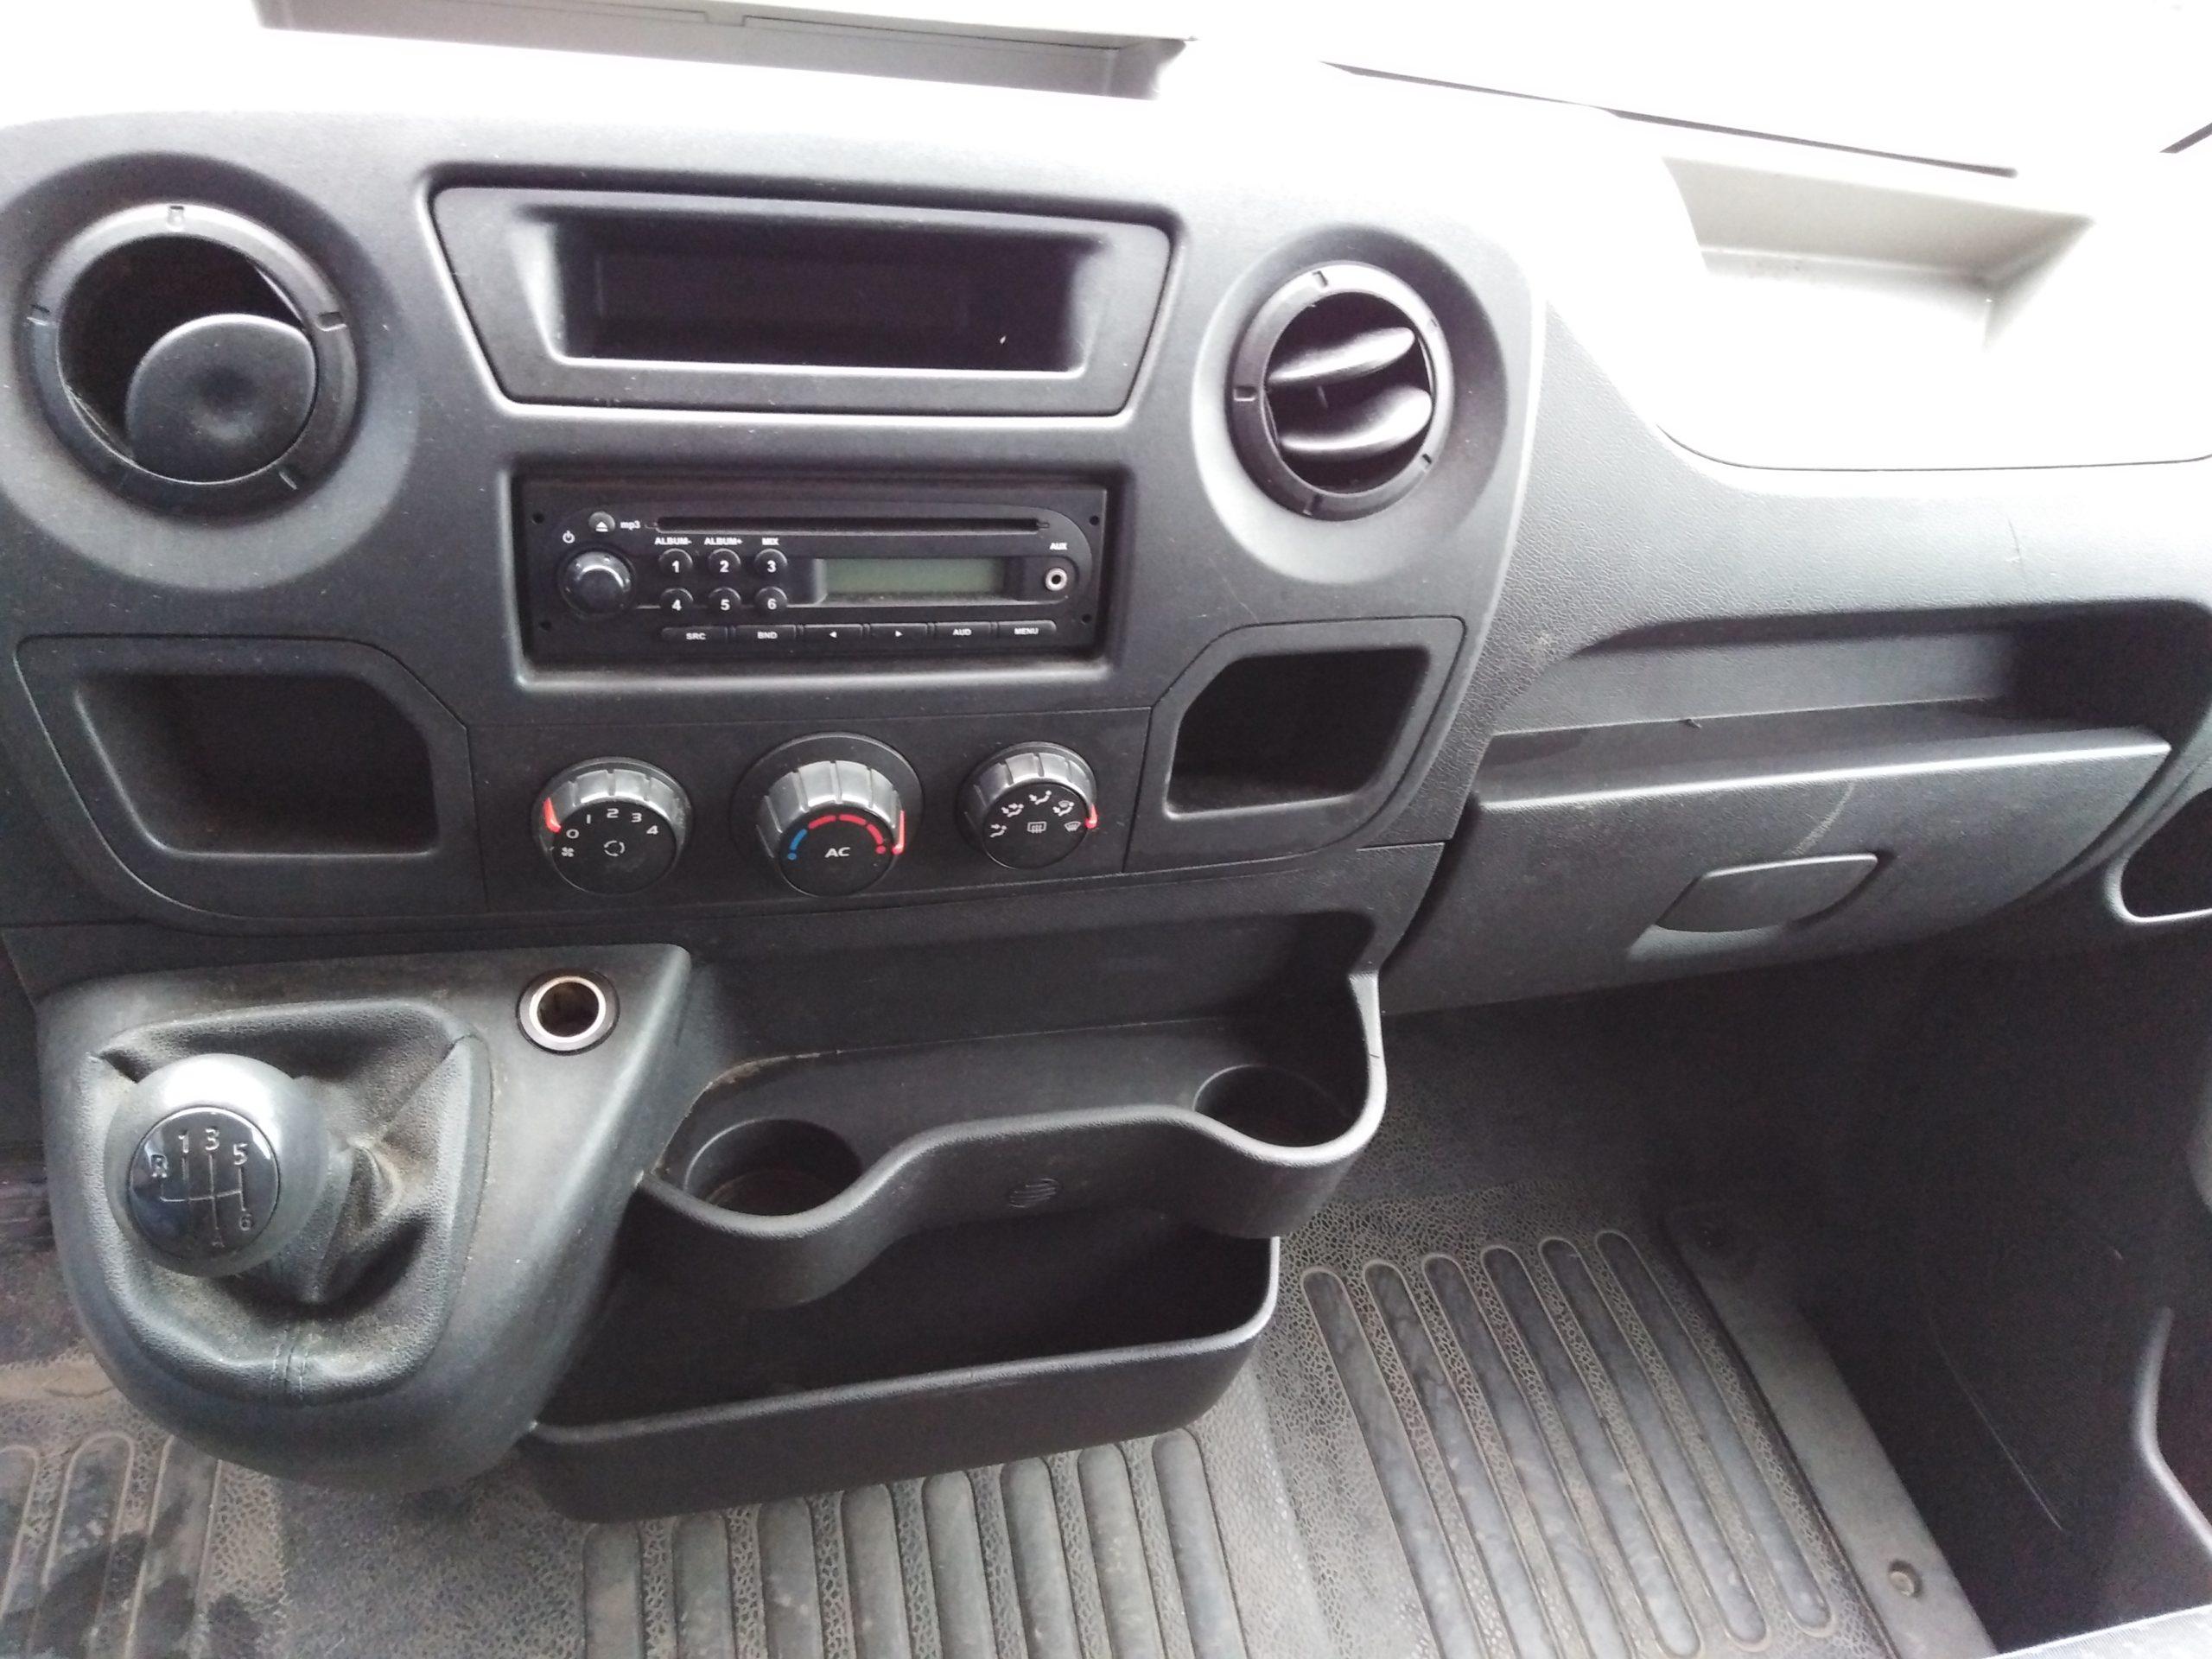 Location d'un utilitaire fourgon à caisse grand volume - Opel Movano 20m3 - Vue6